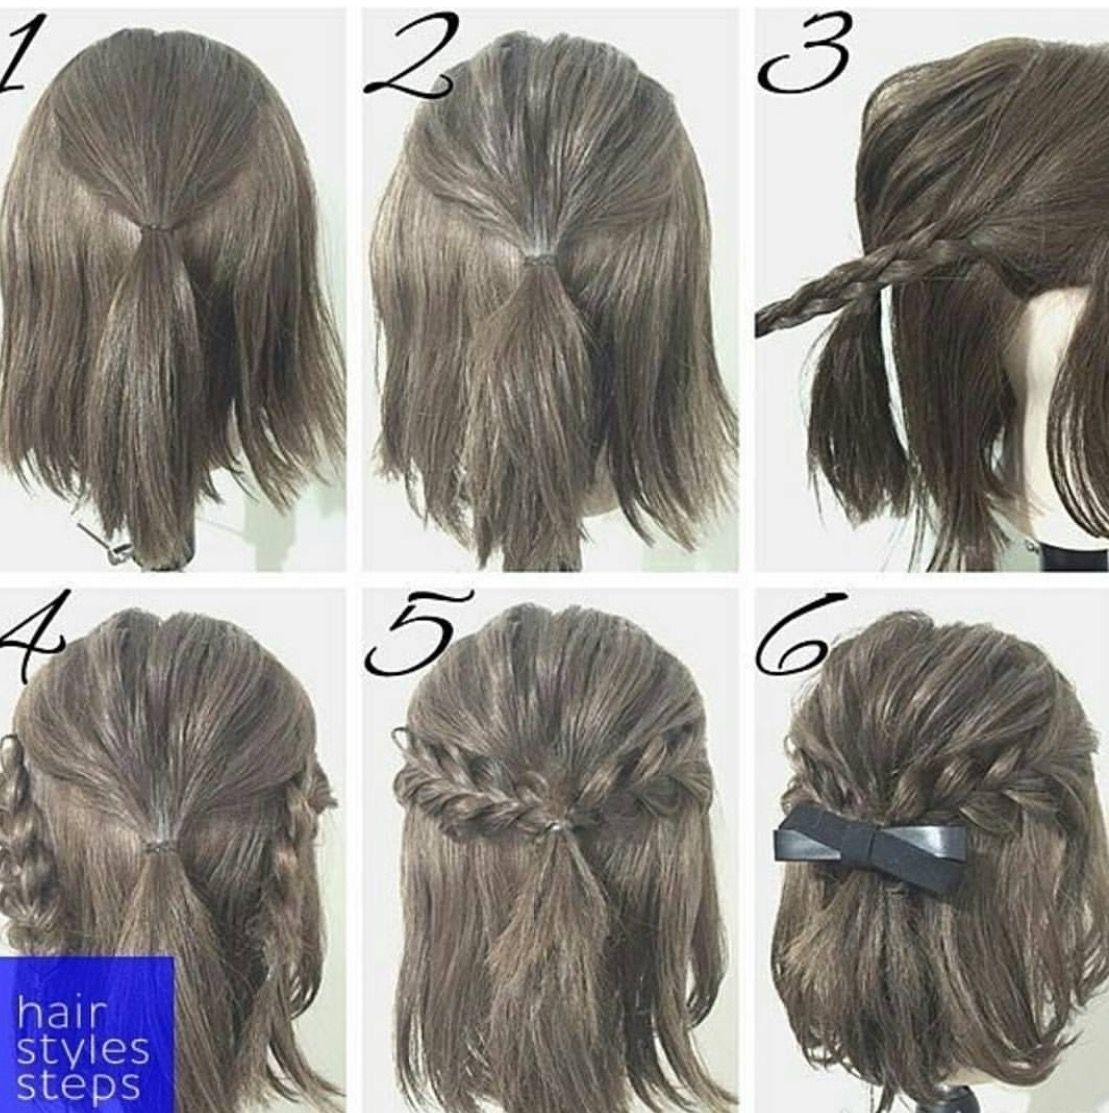 Pin by arooj fatima on hair pinterest hair style short hair and